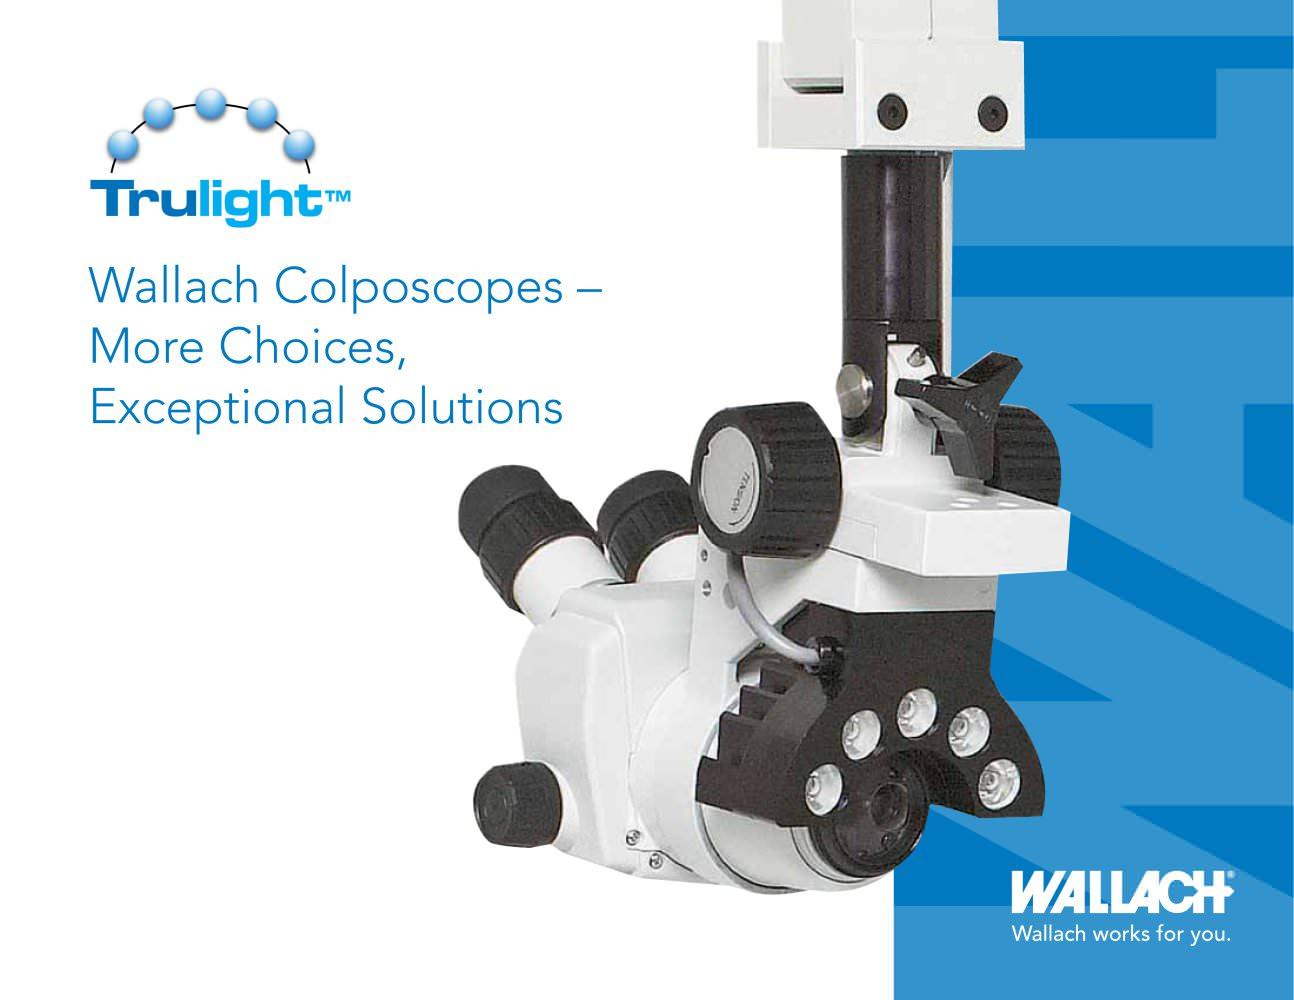 wallach colposcope